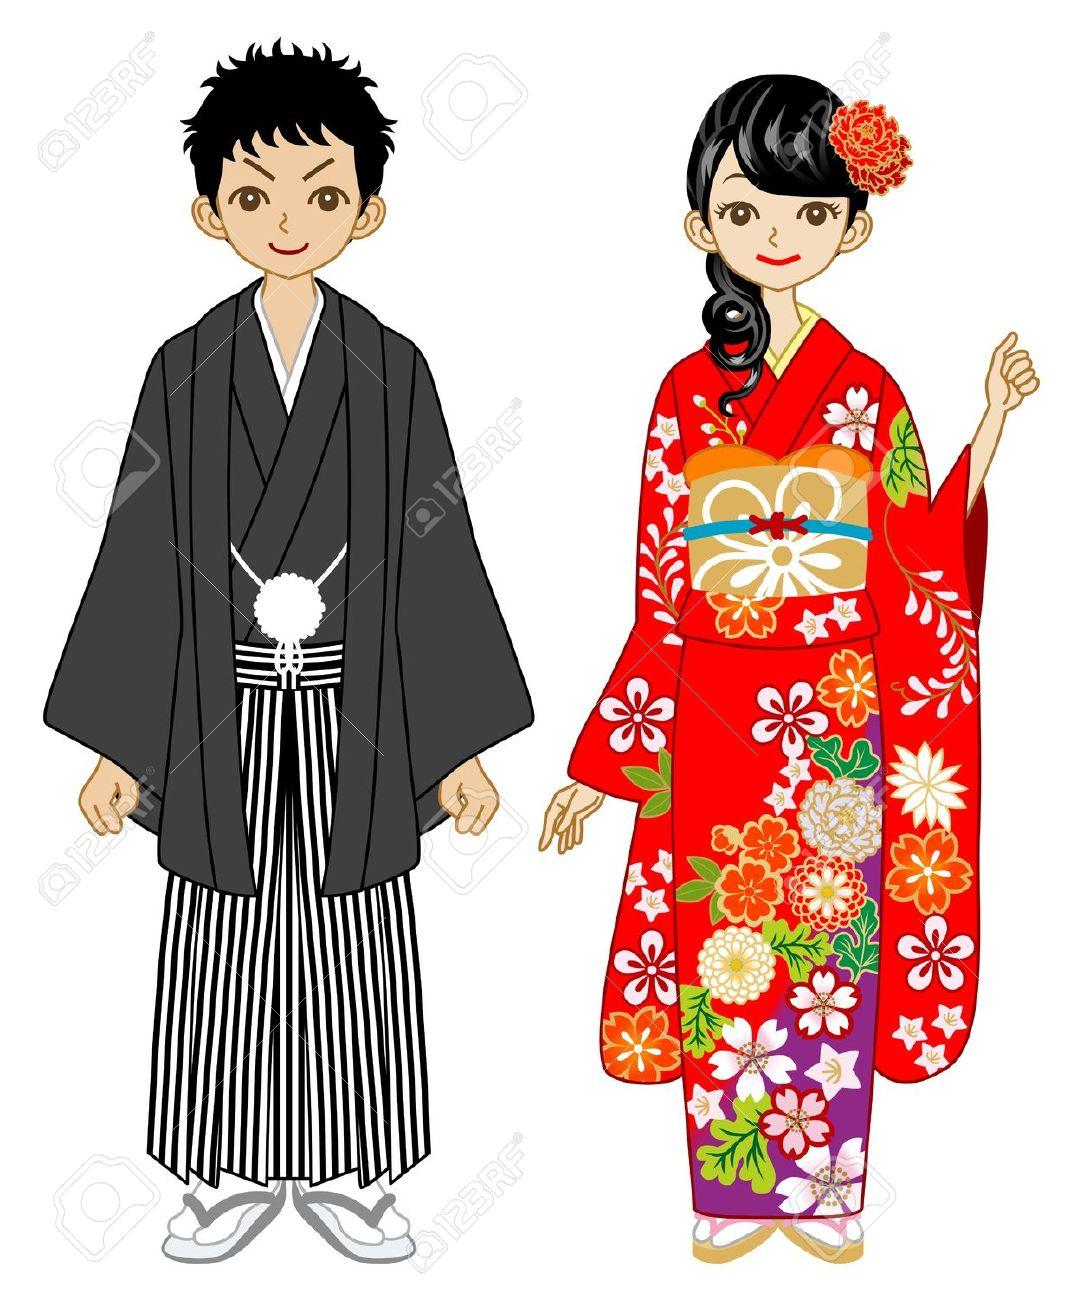 Kimono clipart #5